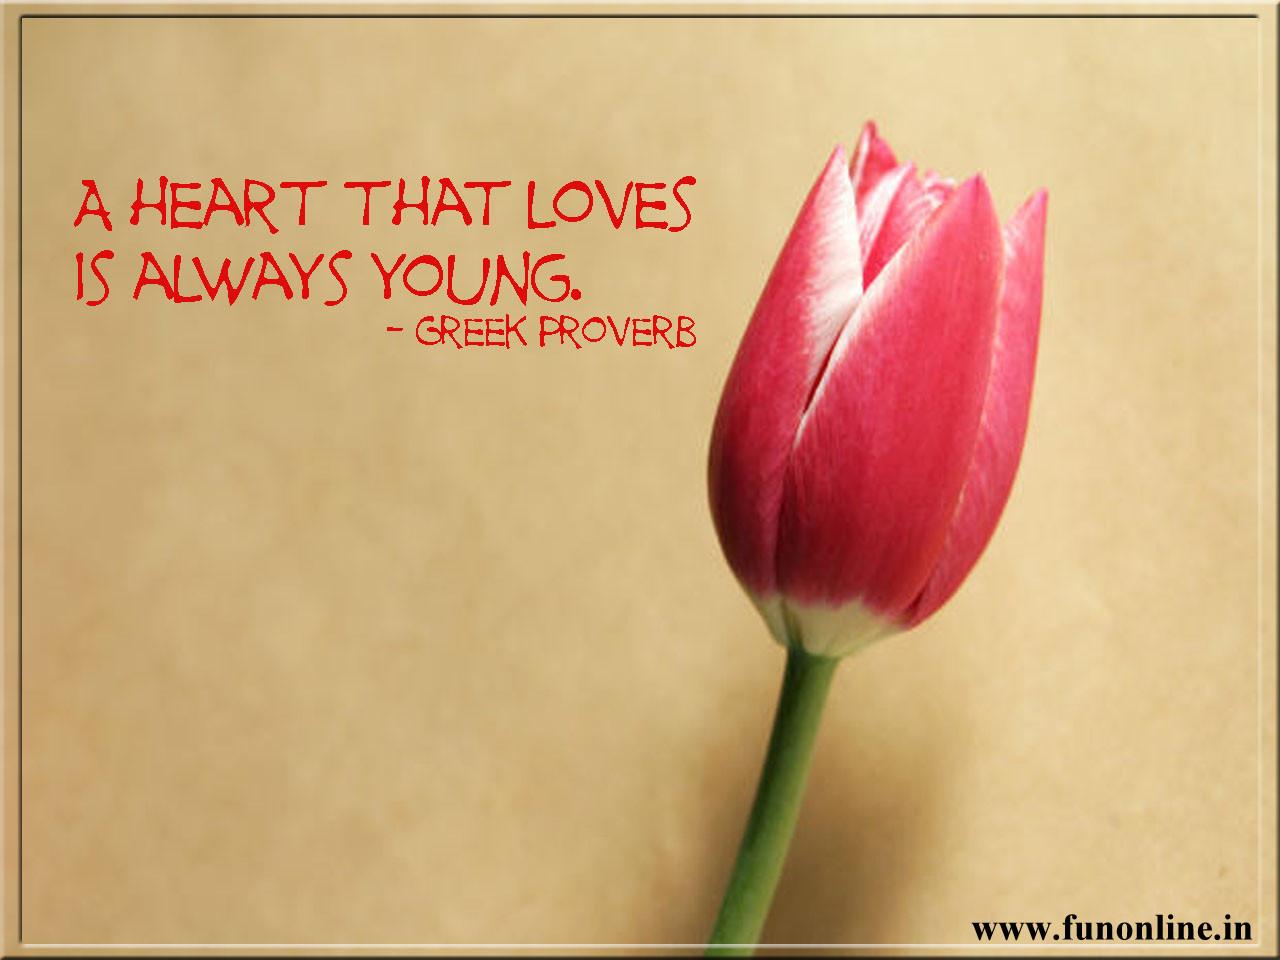 quotes love quotes love quotes love quotes love quotes love quotes 1280x960